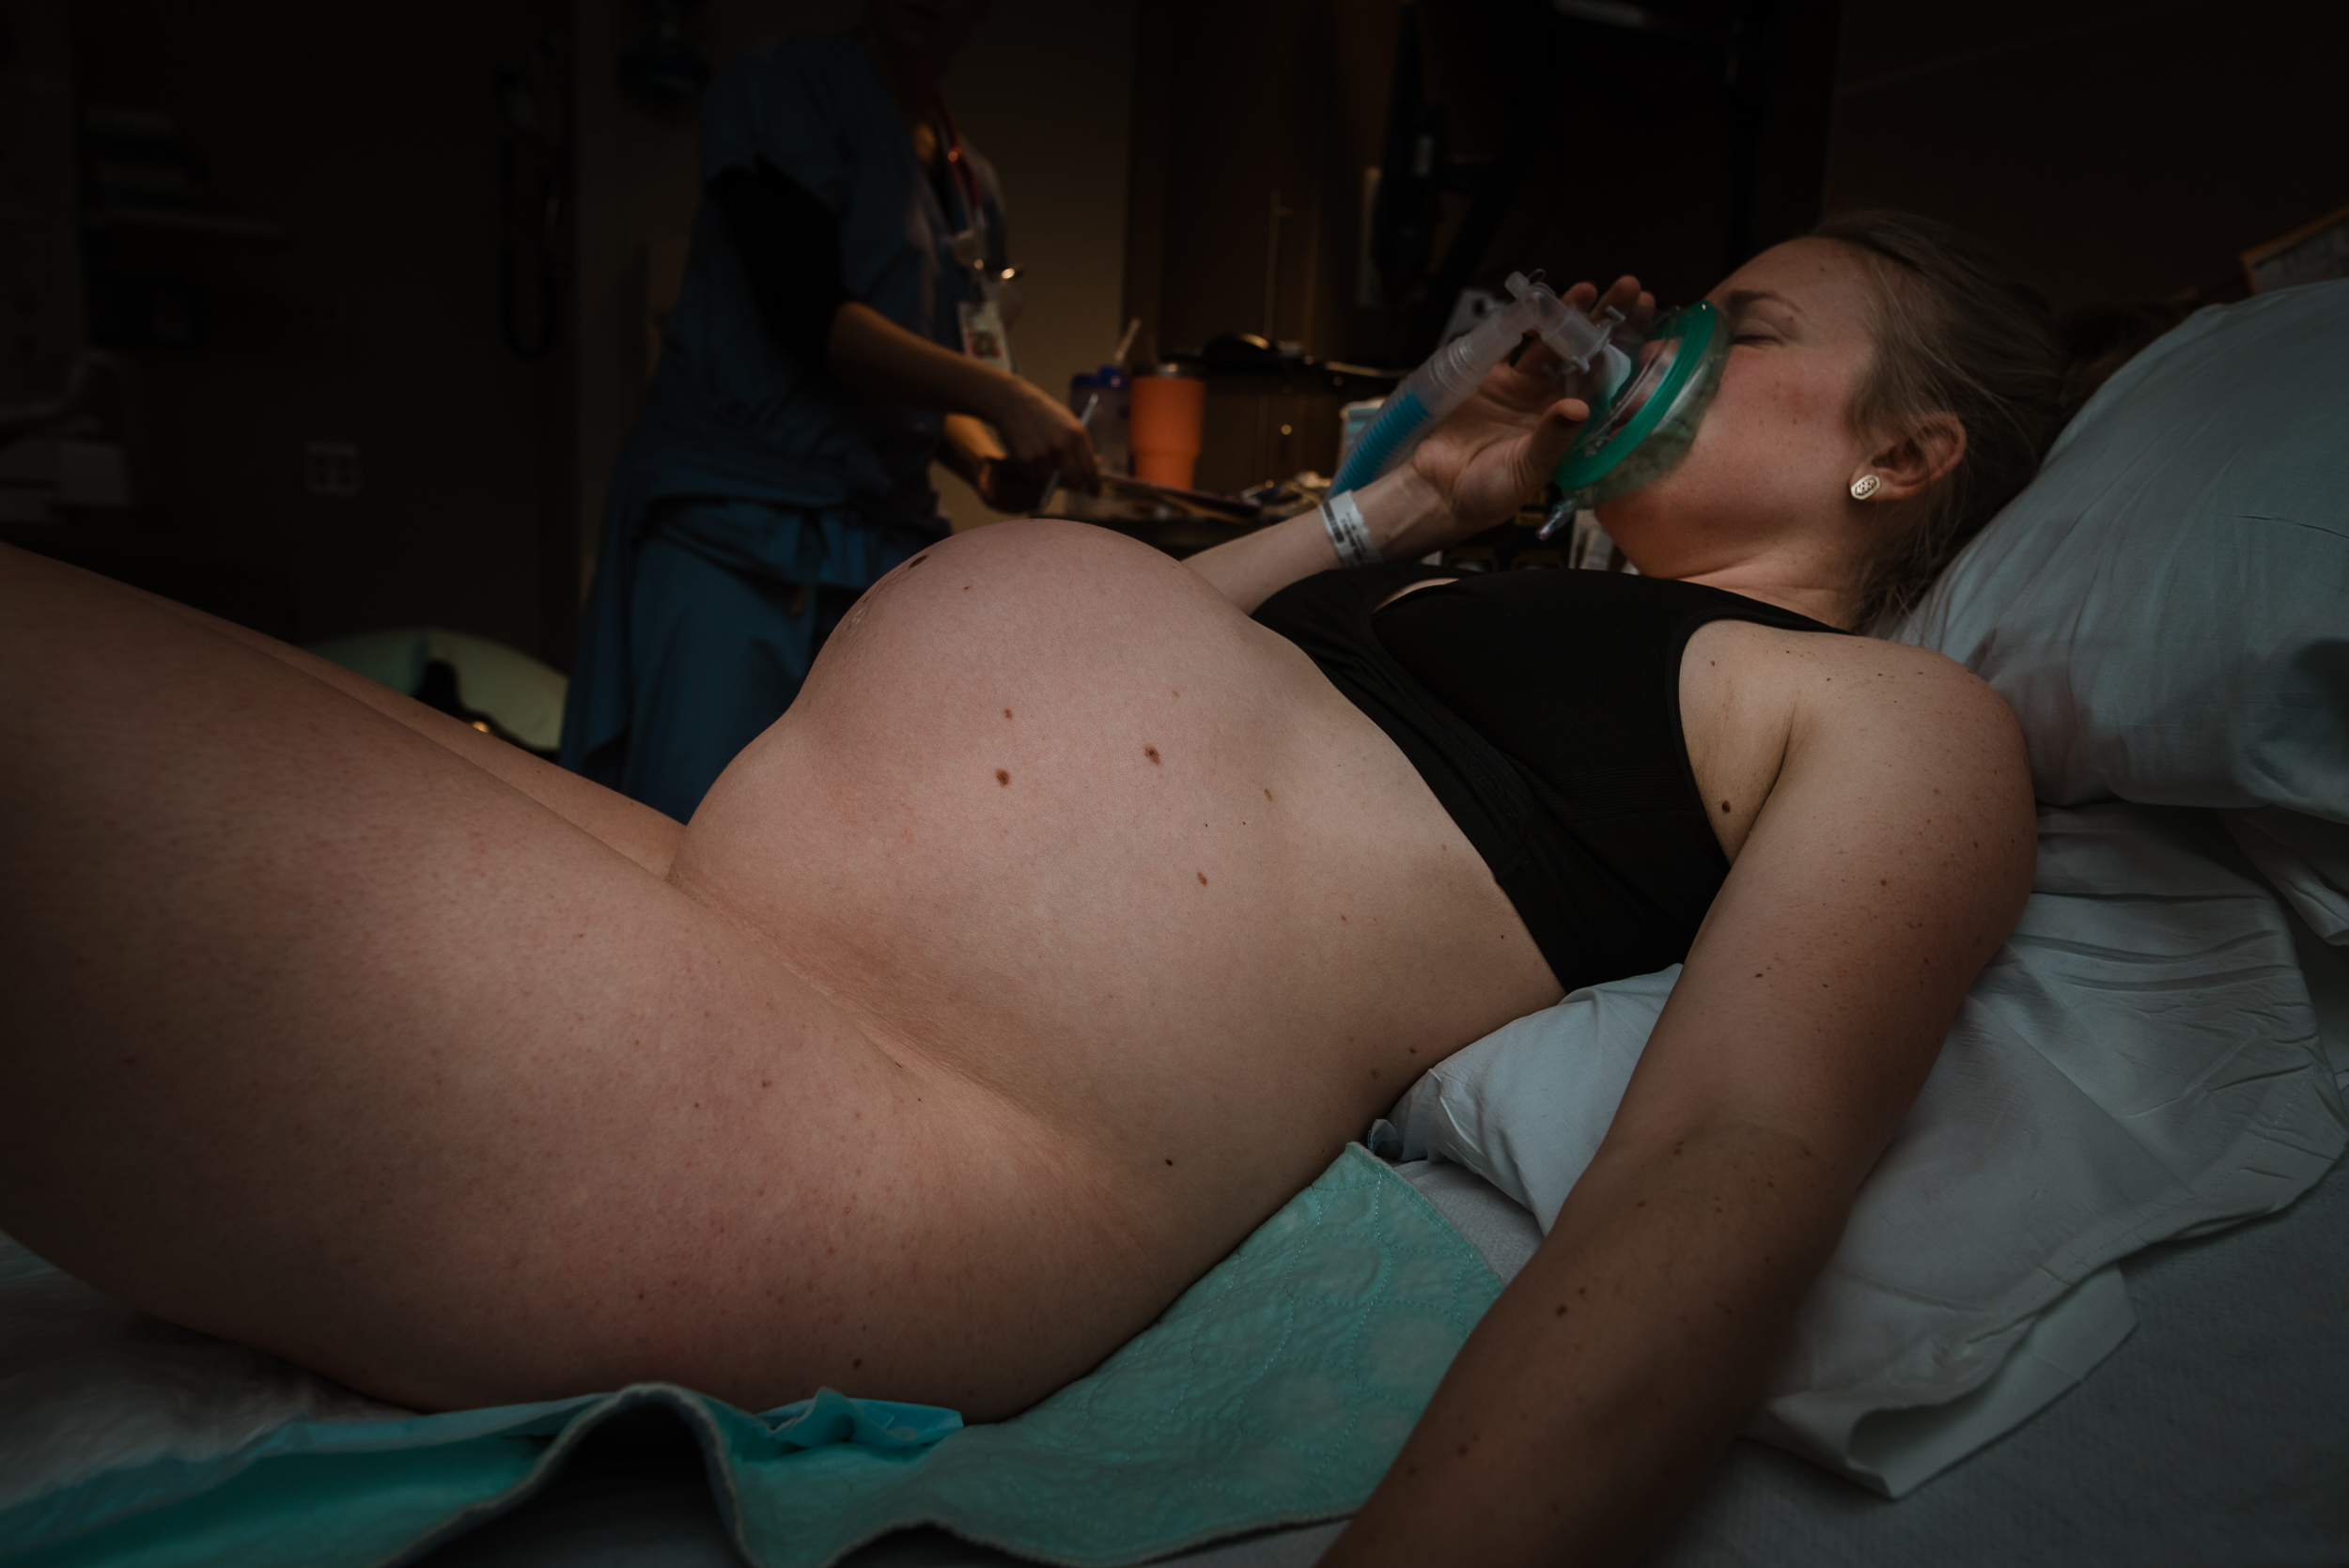 Best Birth Photography Minneapolis St. Paul Minnesota Meredith Westin-December 26, 2018-175851.jpg